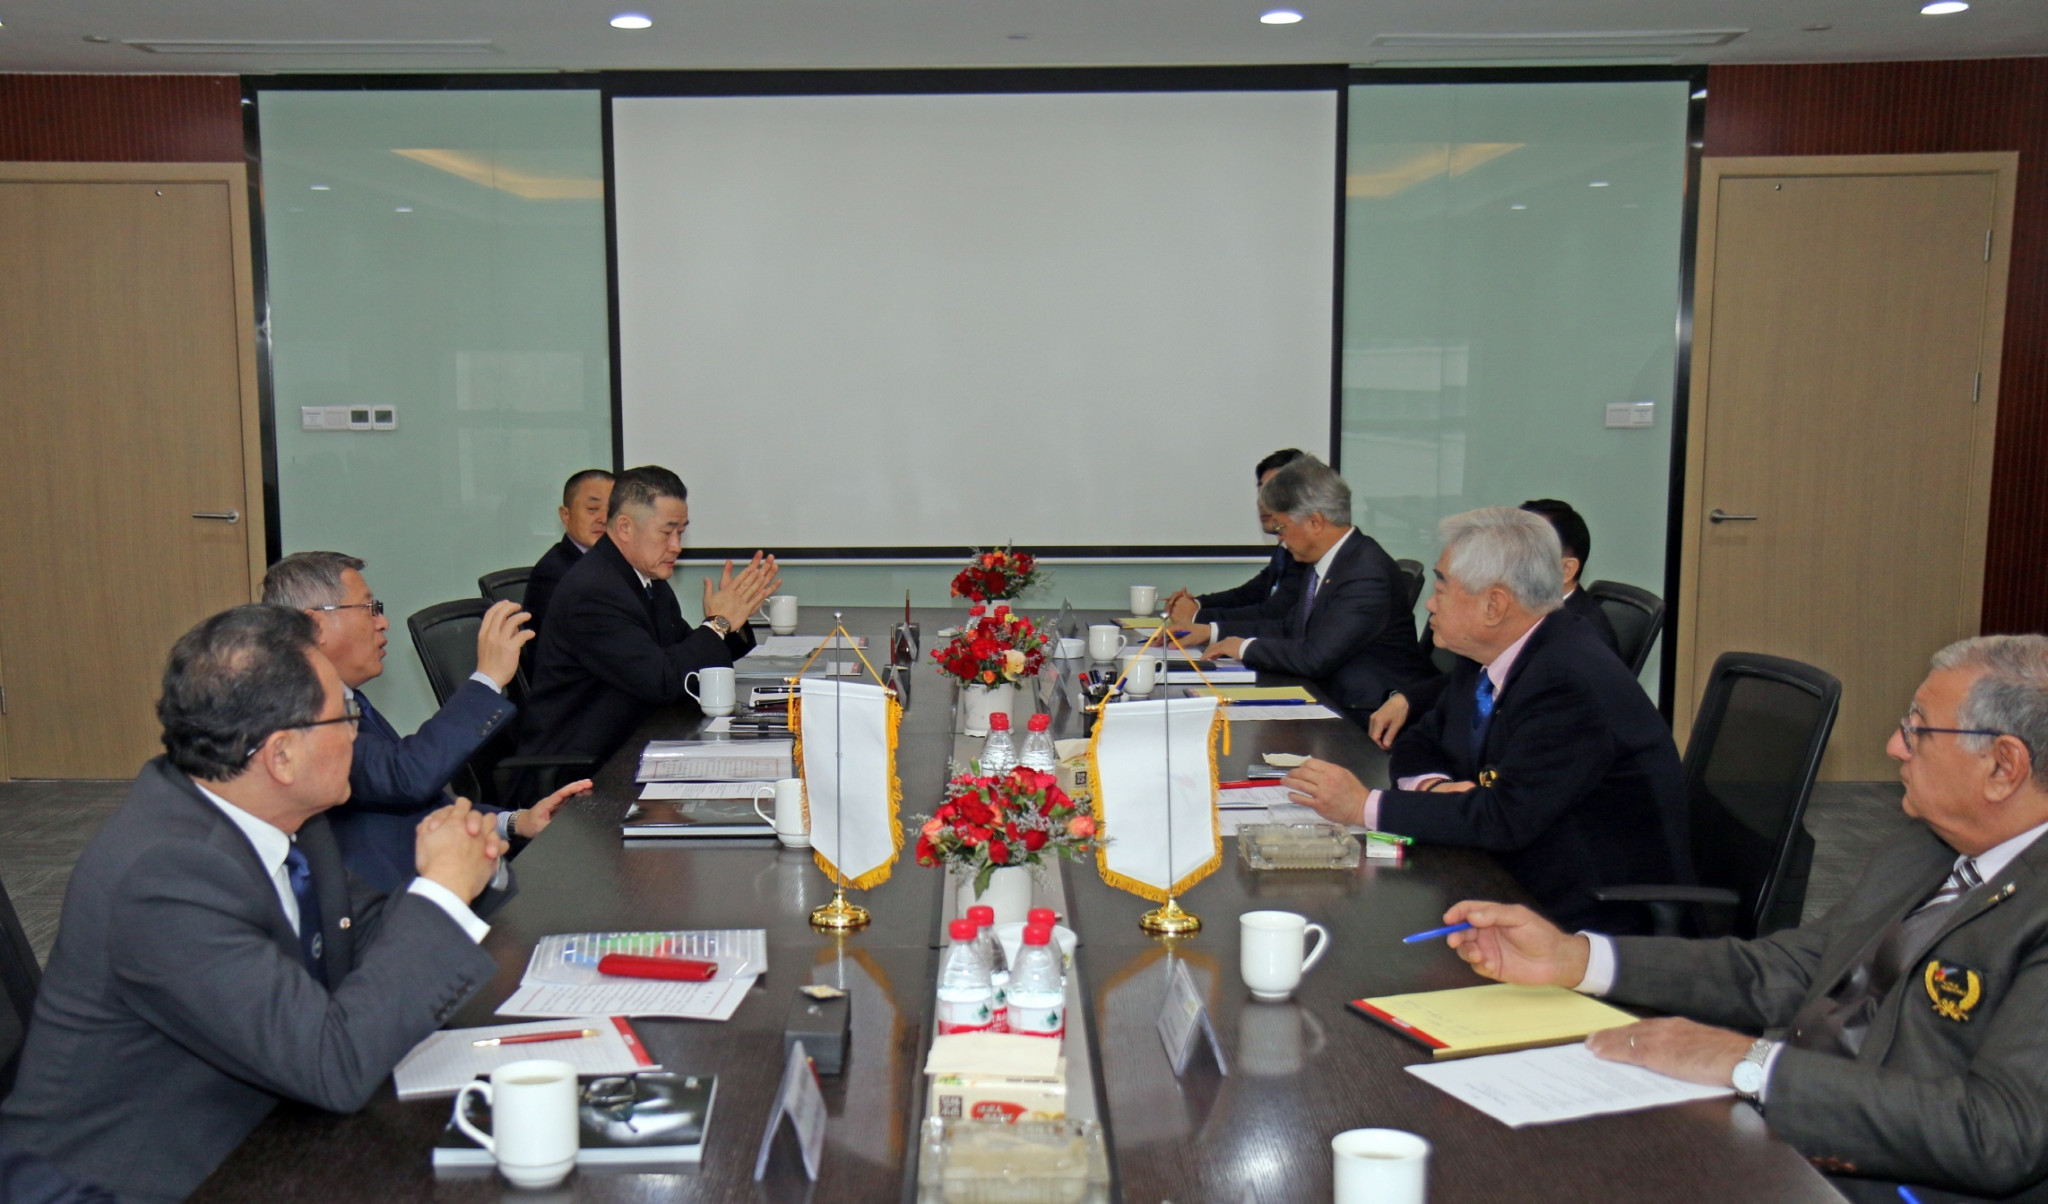 World Taekwondo President Chungwon Choue, right, met with his ITF counterpart Ri Yong-son, left ©World Taekwondo